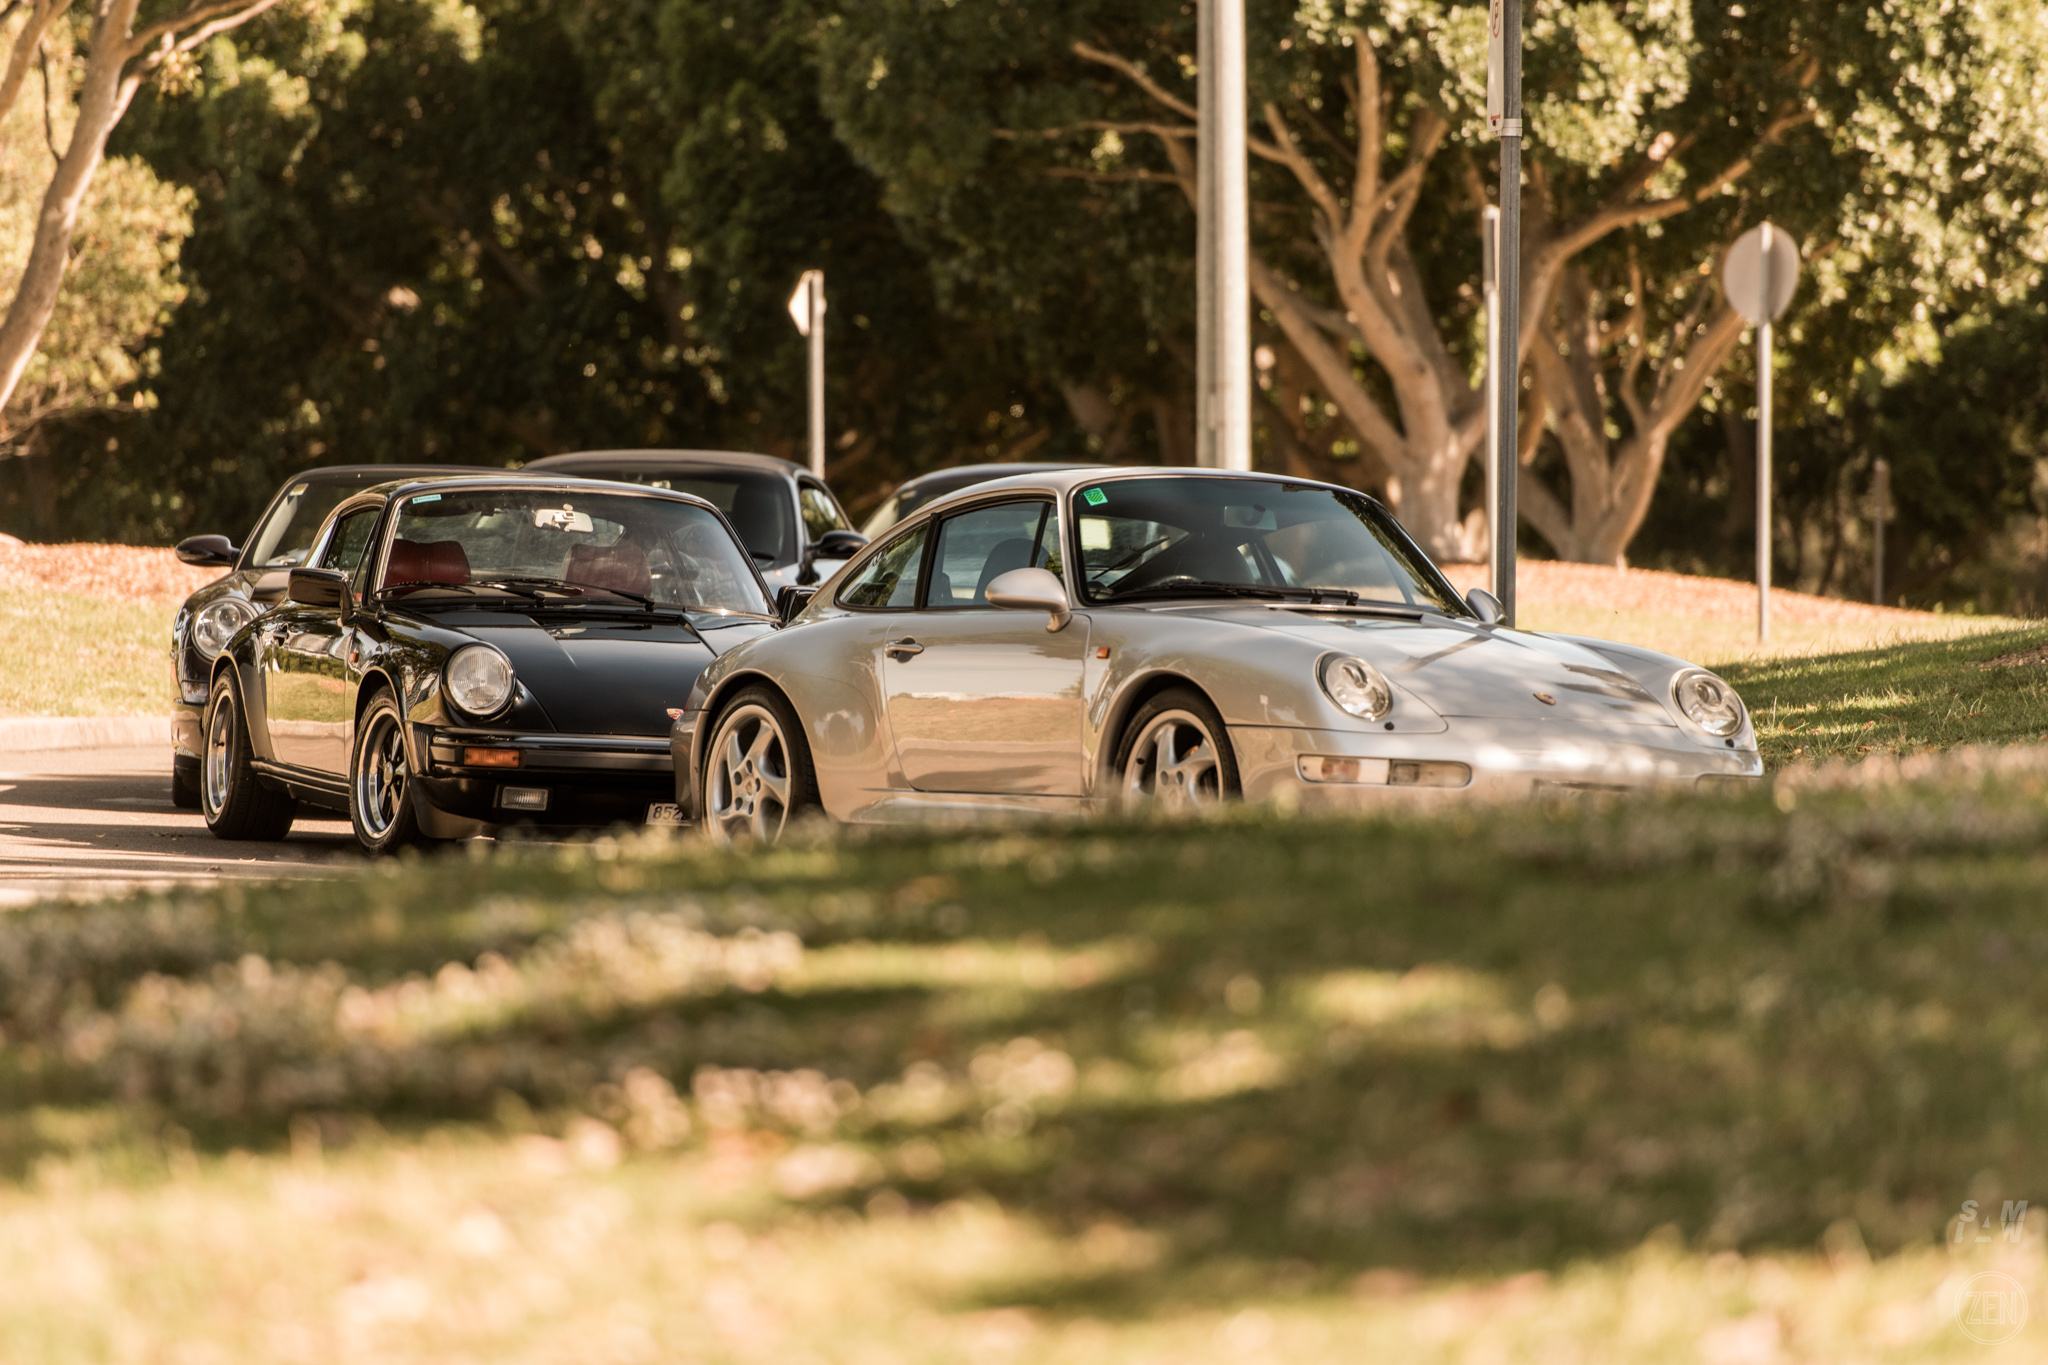 2019-10-27 - Autohaus Porsches & Coffee 168